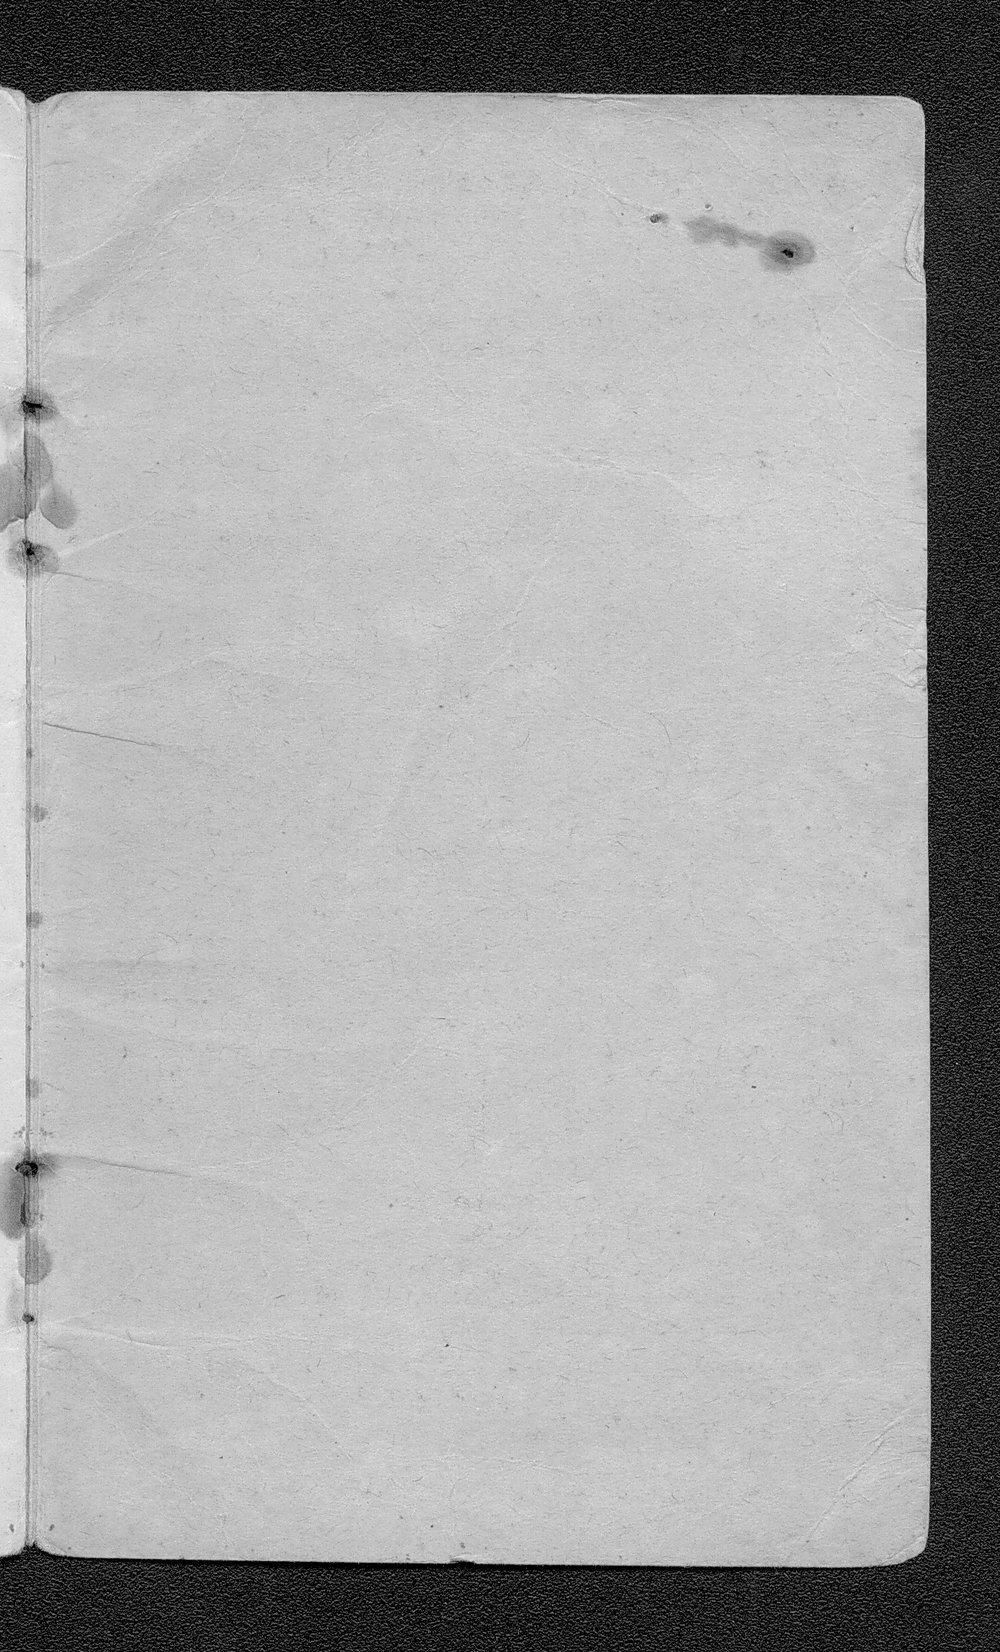 Carrol Victor Christian to Floriene Olive Graham Christian correspondece - 7